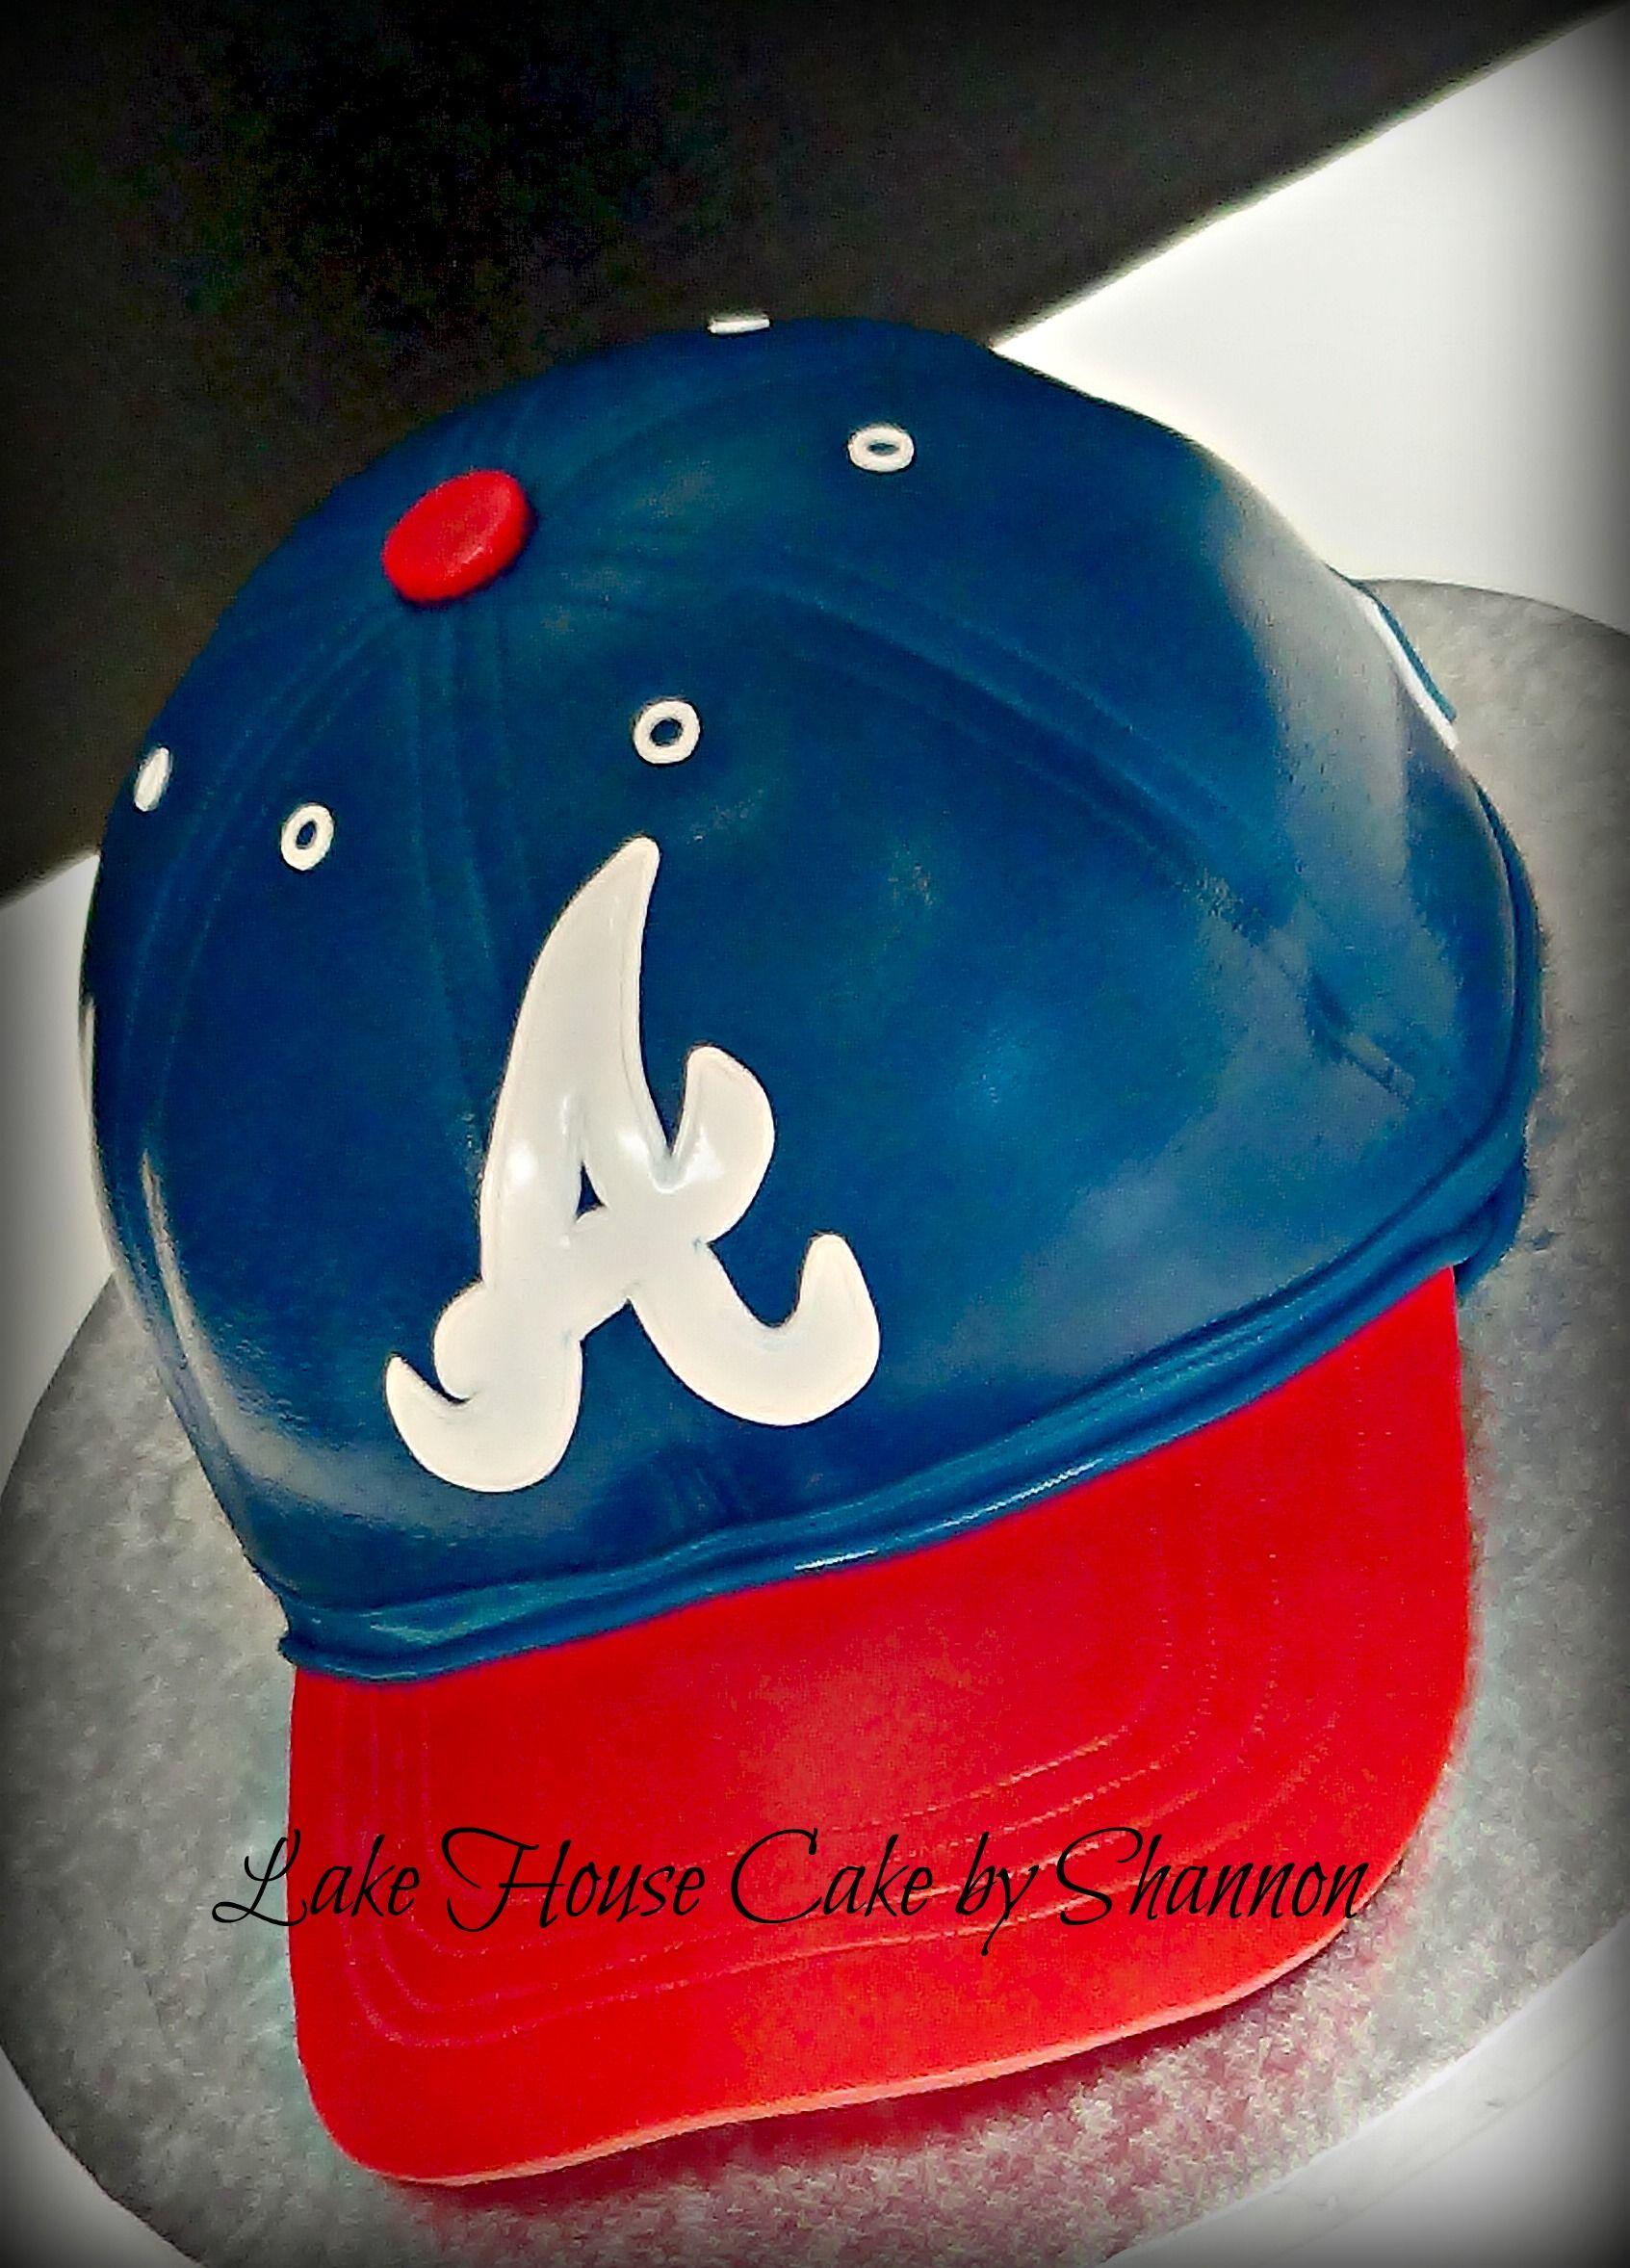 Atlanta Braves Baseball Cap Hat Red White Blue Groom s Cake Lake House Cake  by Shannon e1c132a1e50a